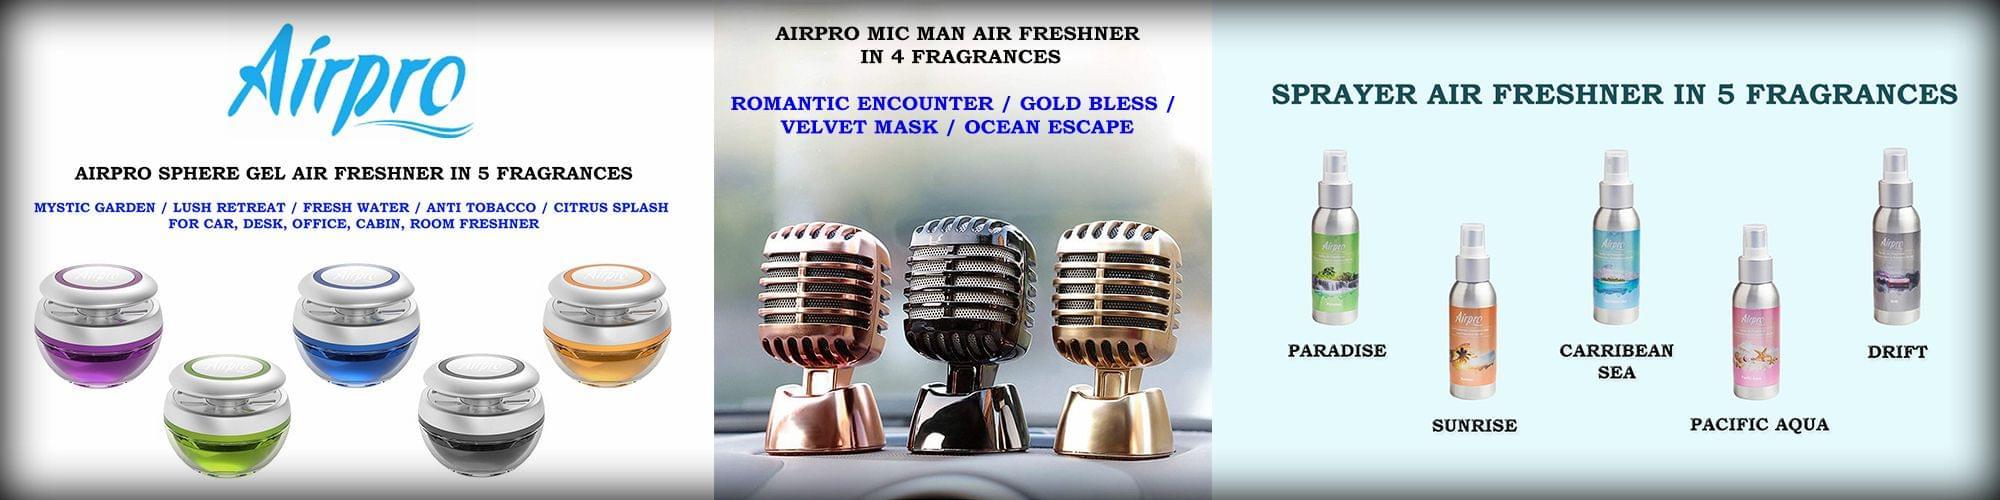 AIRPRO AIR FRESHNERS